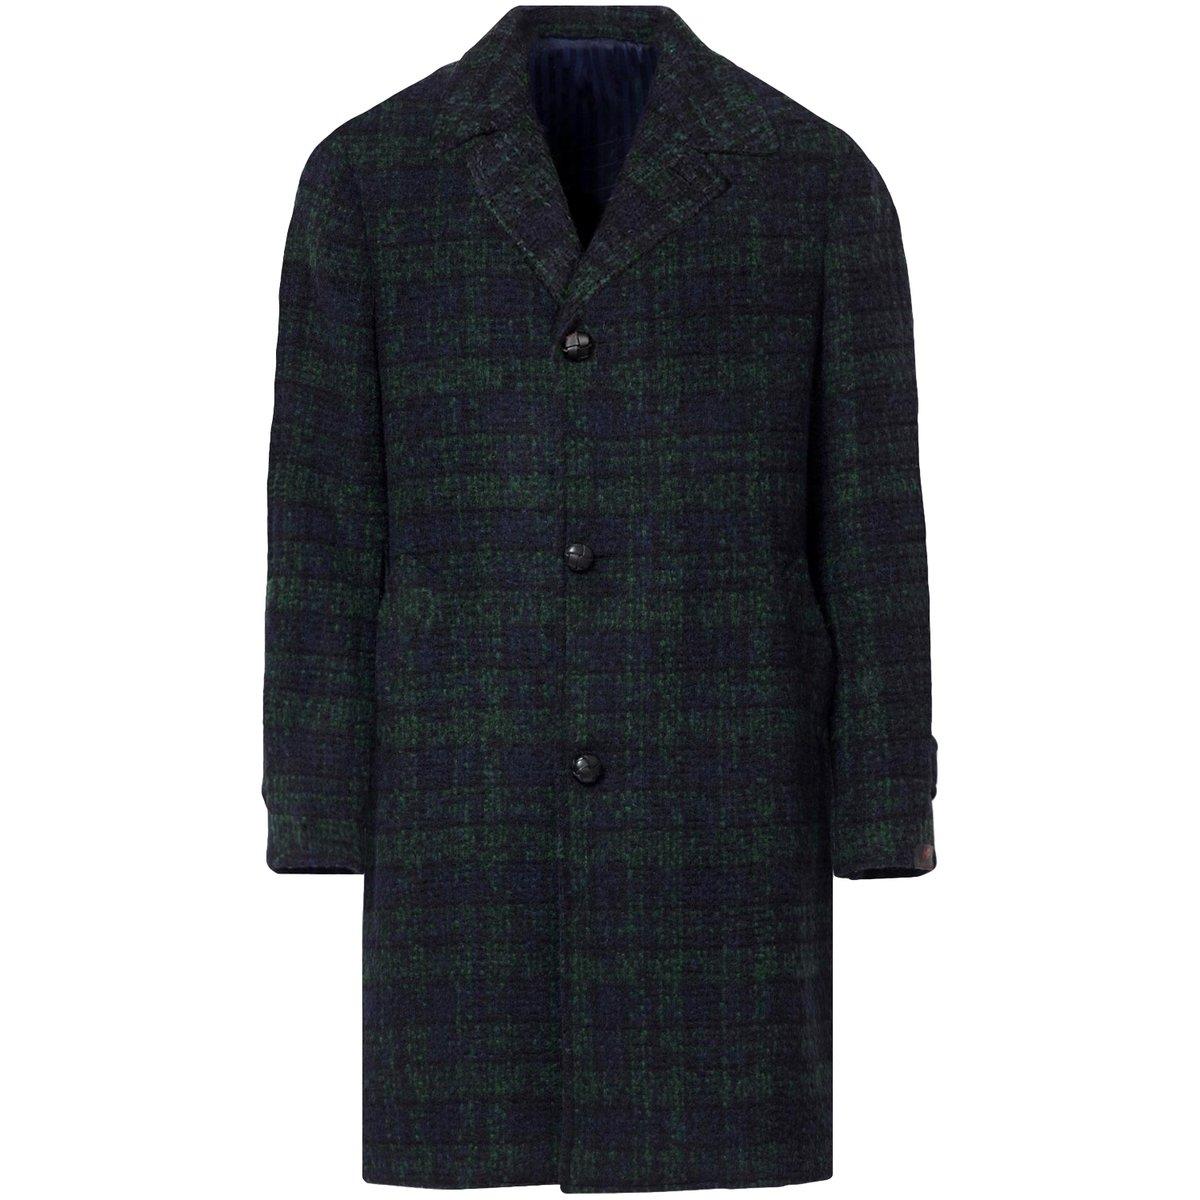 mp-massimo-piombo-Green-checked-Checked-Wool-Coat 2.jpg